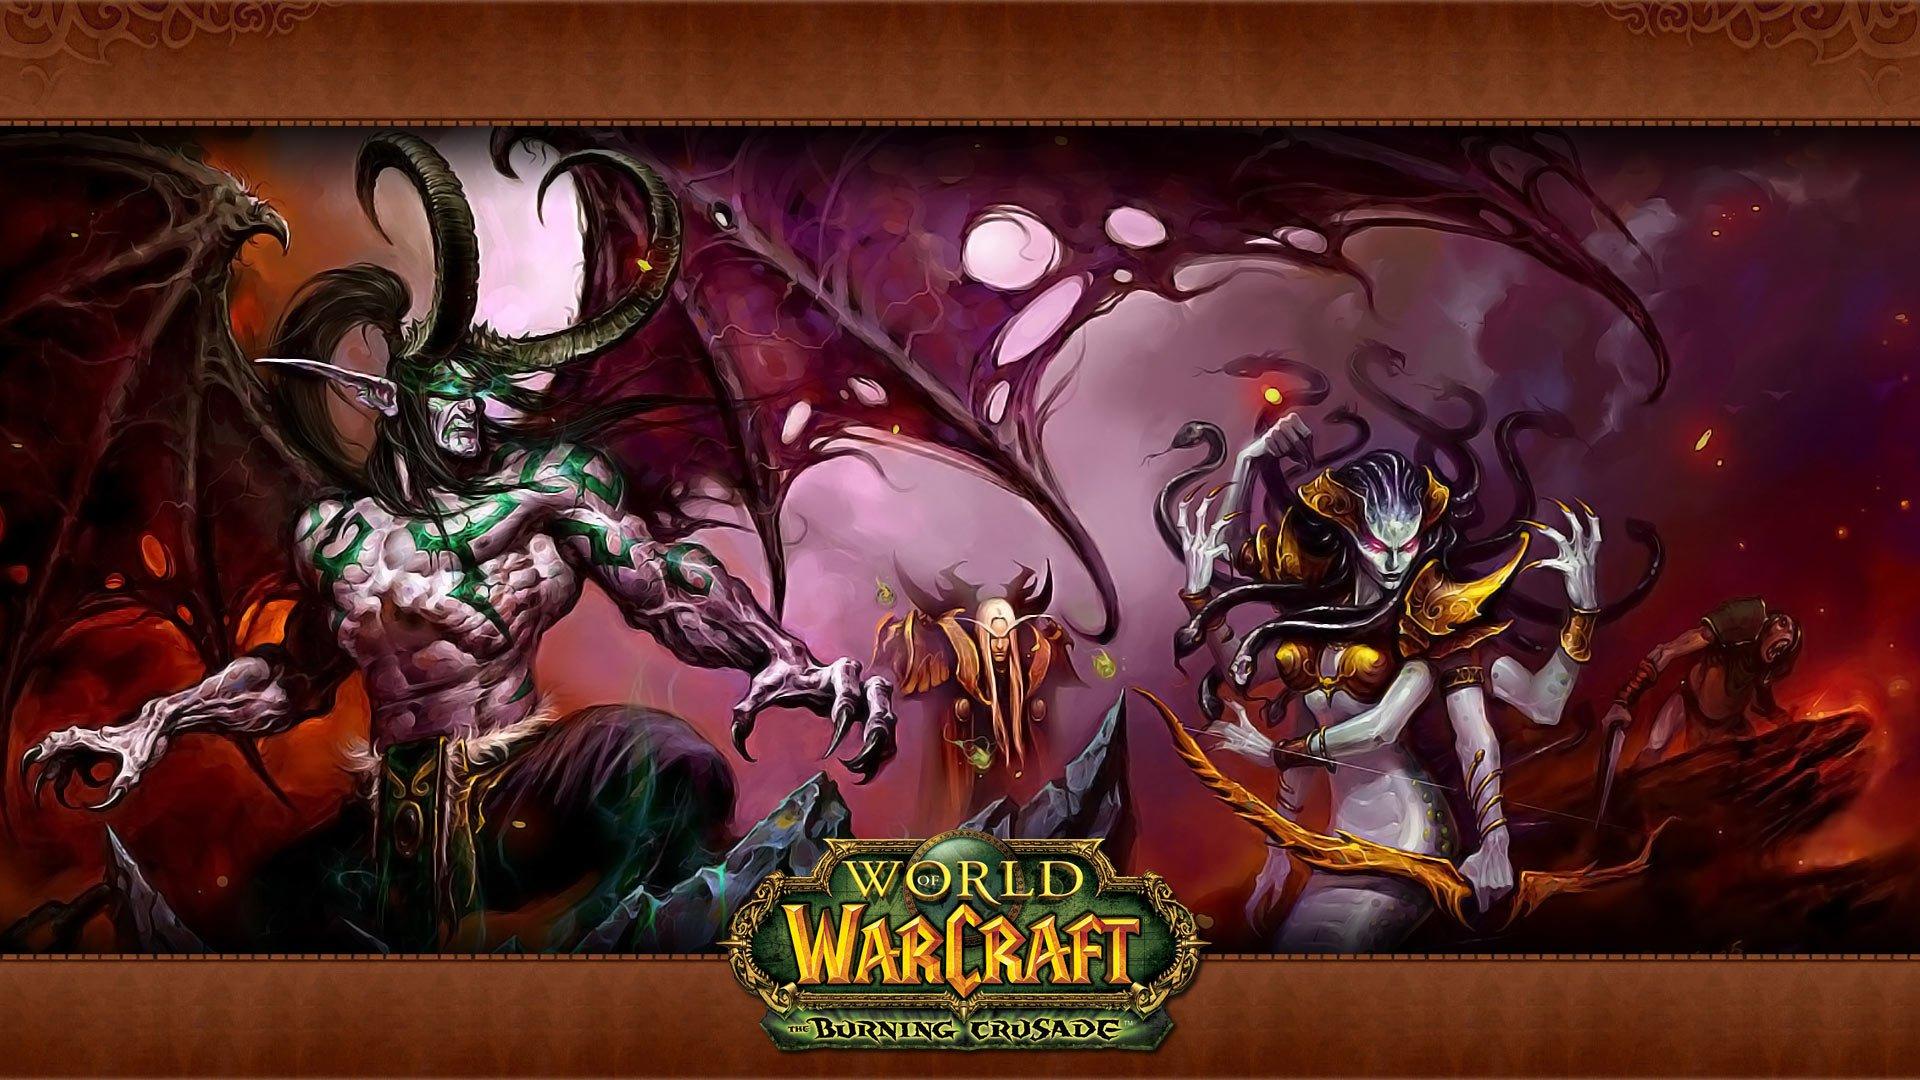 World Of Warcraft The Burning Crusade Fondo De Pantalla Hd